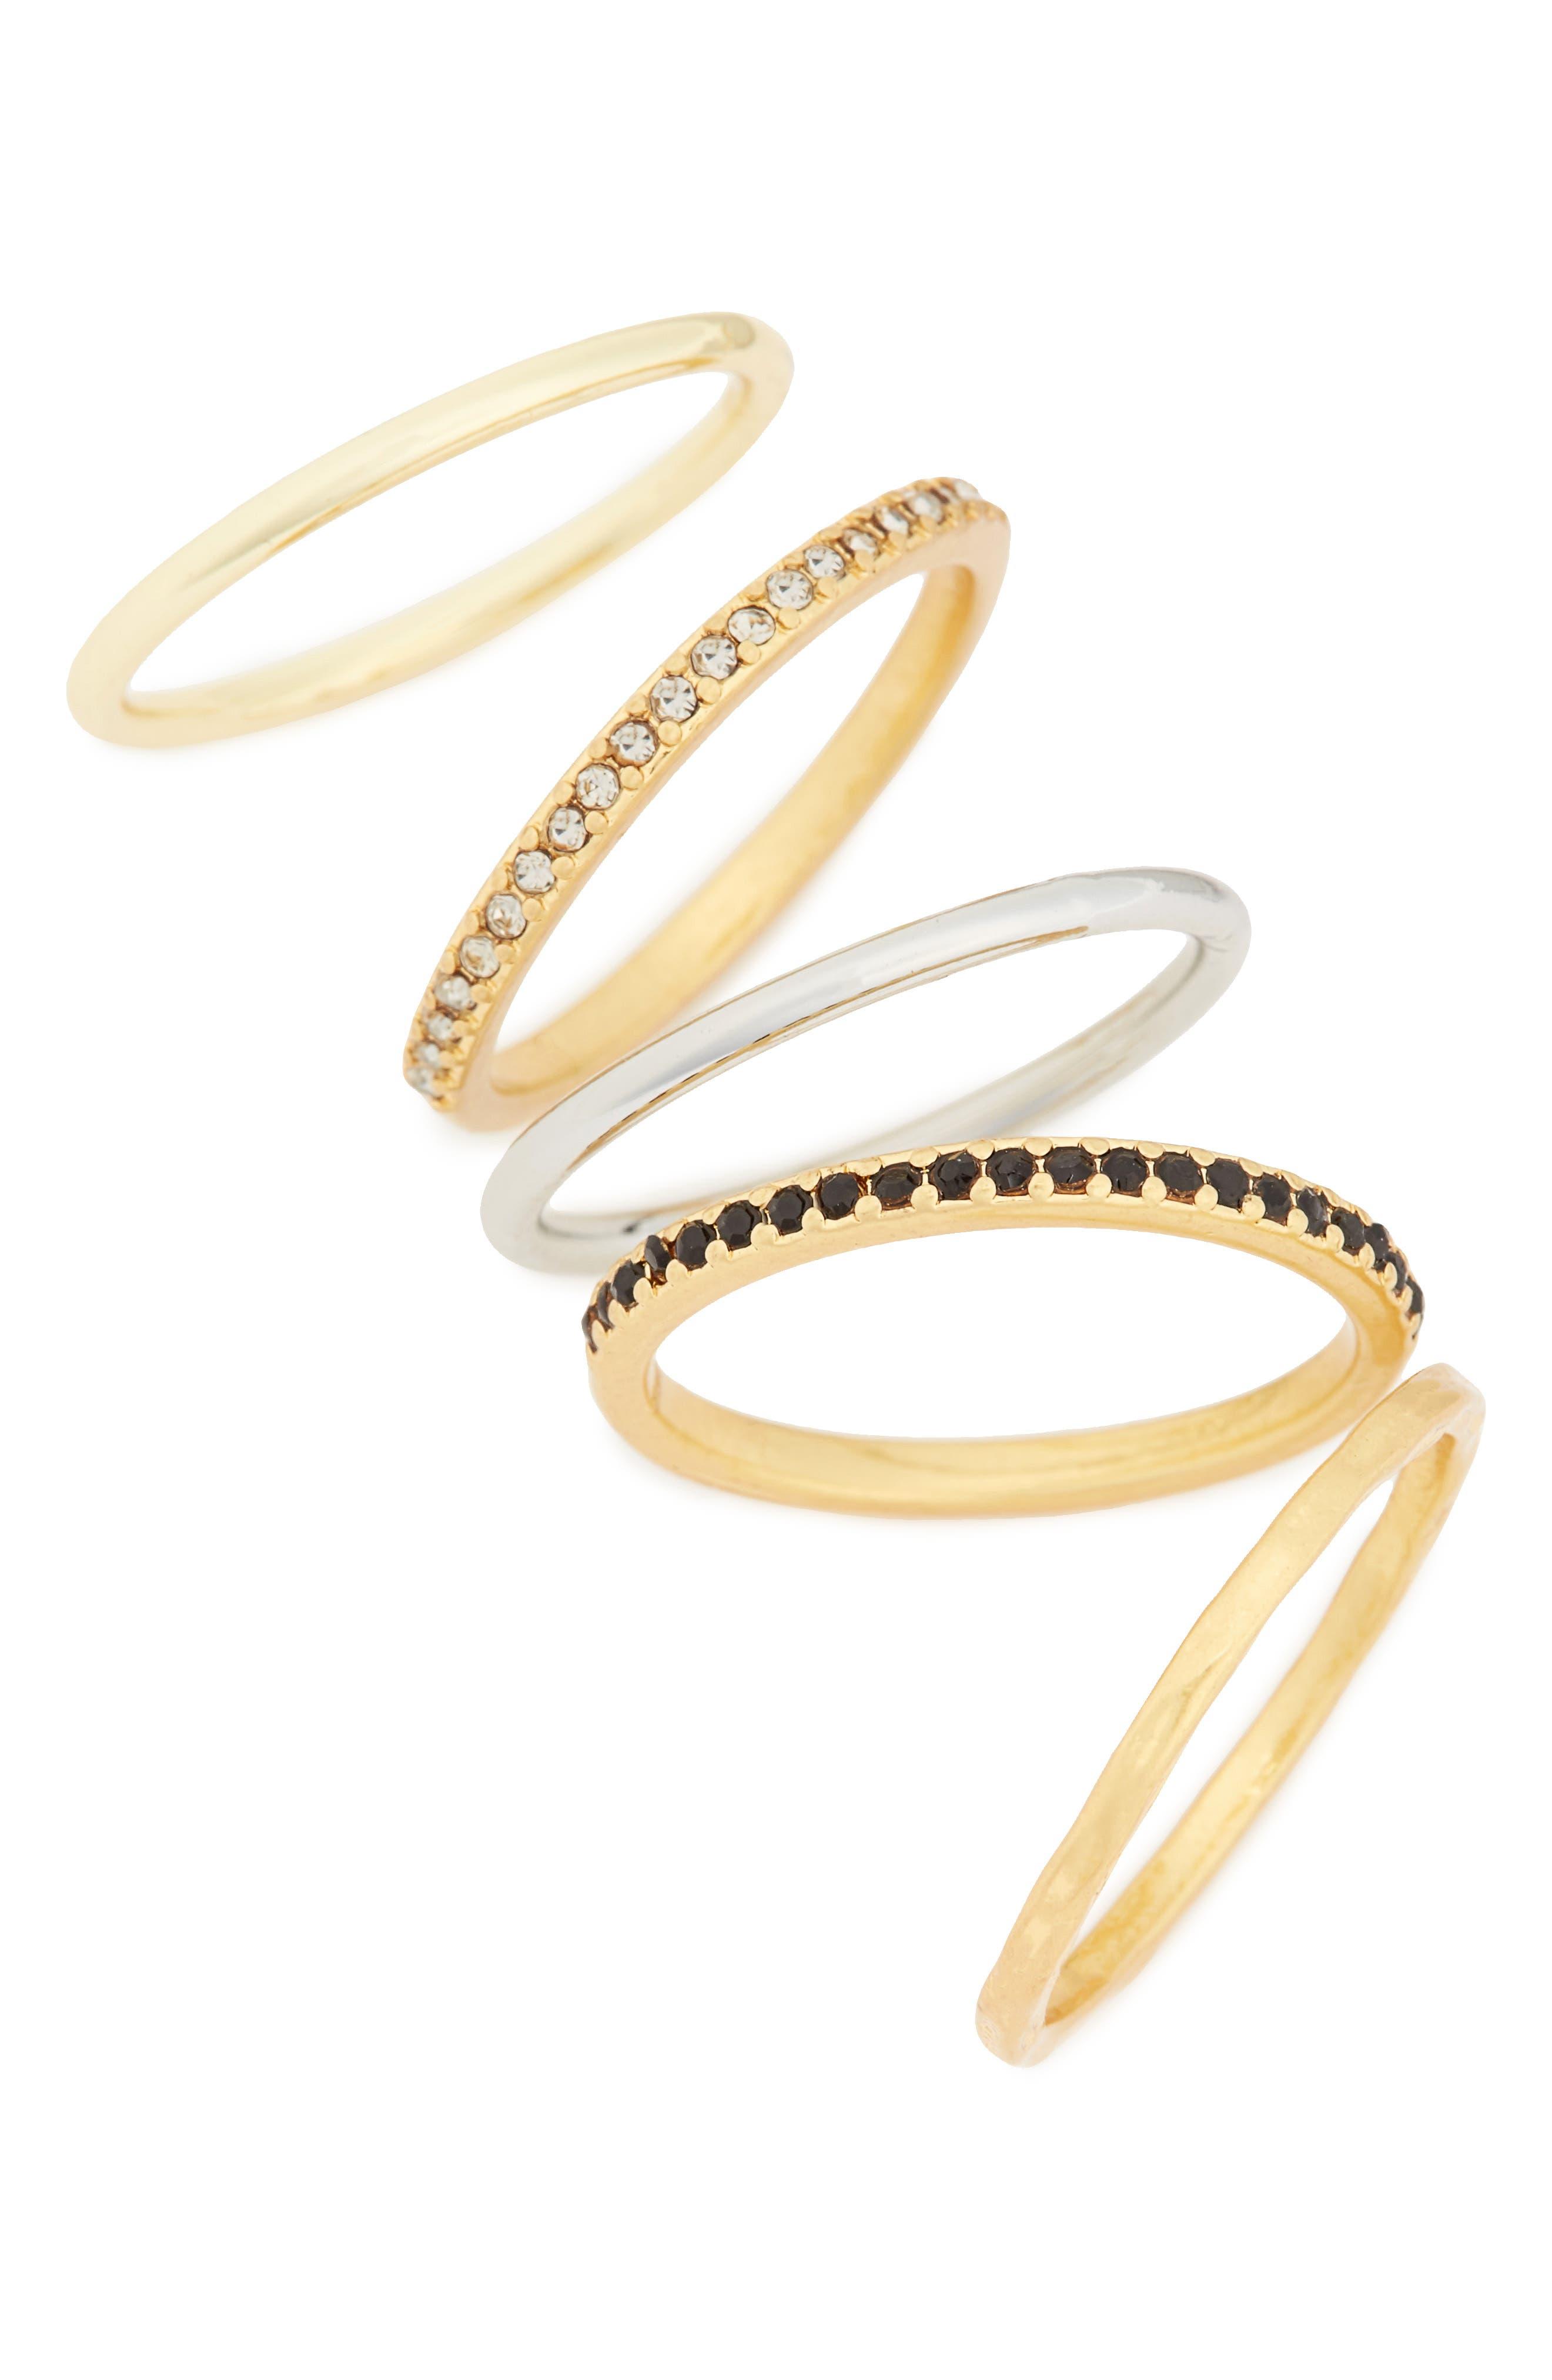 Filament Set of 5 Stacking Rings,                             Main thumbnail 1, color,                             VINTAGE GOLD